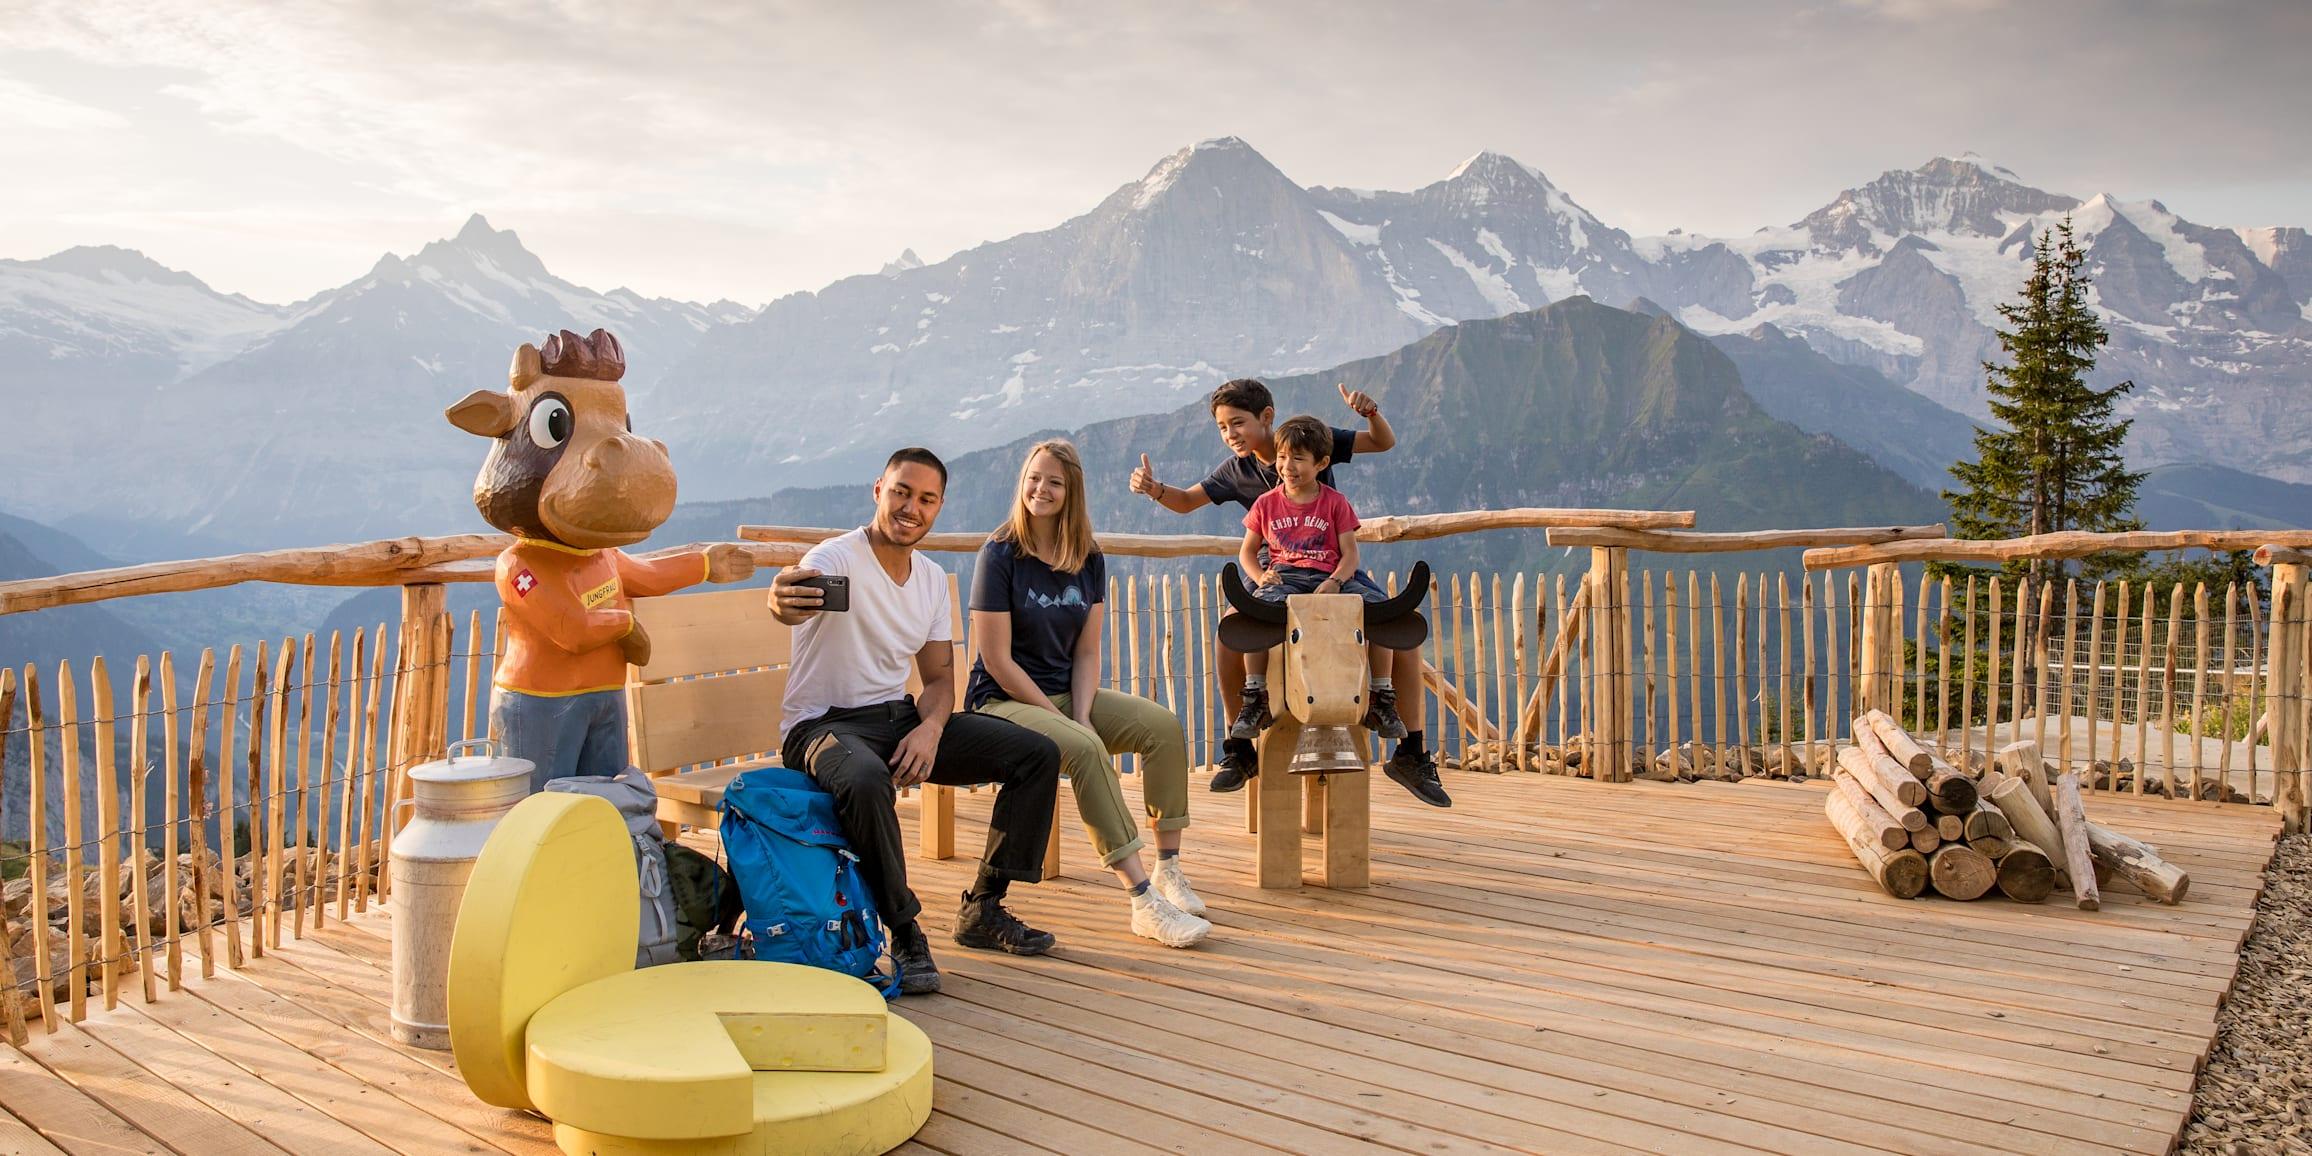 Berge, Eiger, Eiger-Mönch-Jungfrau, Jungfrau, Mönch, Publikationen, Schynige-Platte, Screen-Content, jungfrau.ch